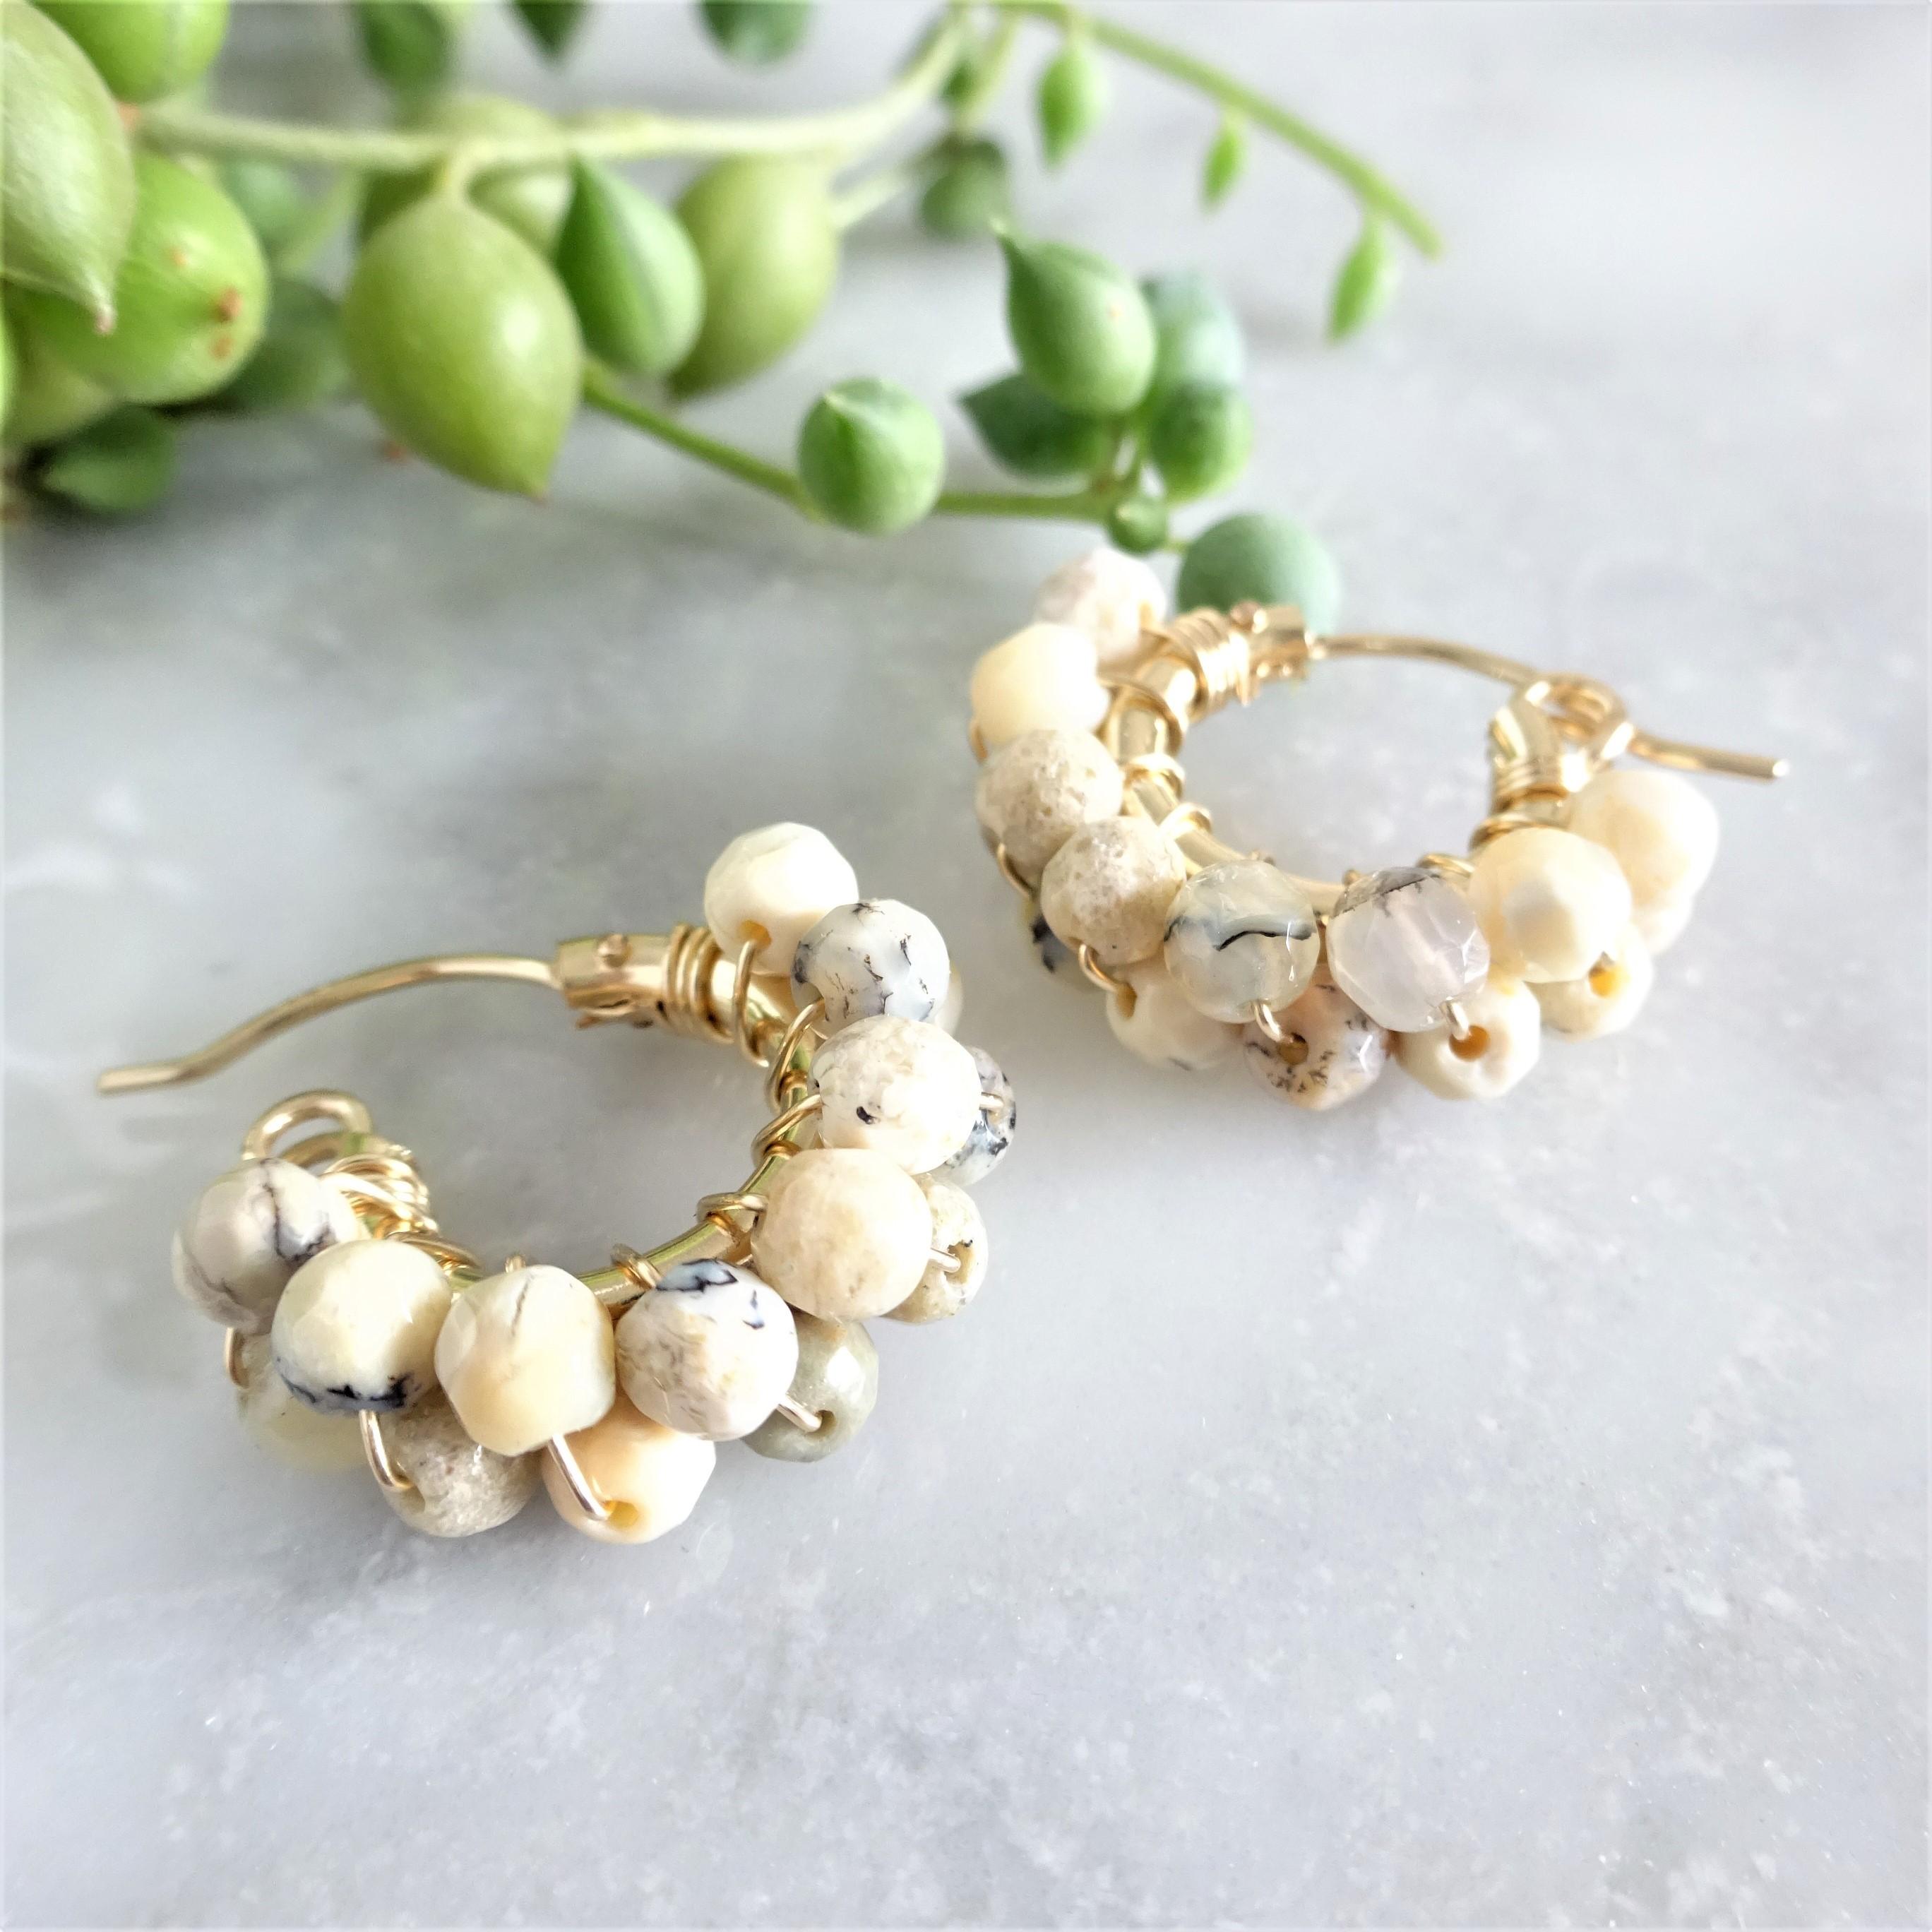 送料無料 14kgf*African Opal wrapped pierced earring / earring